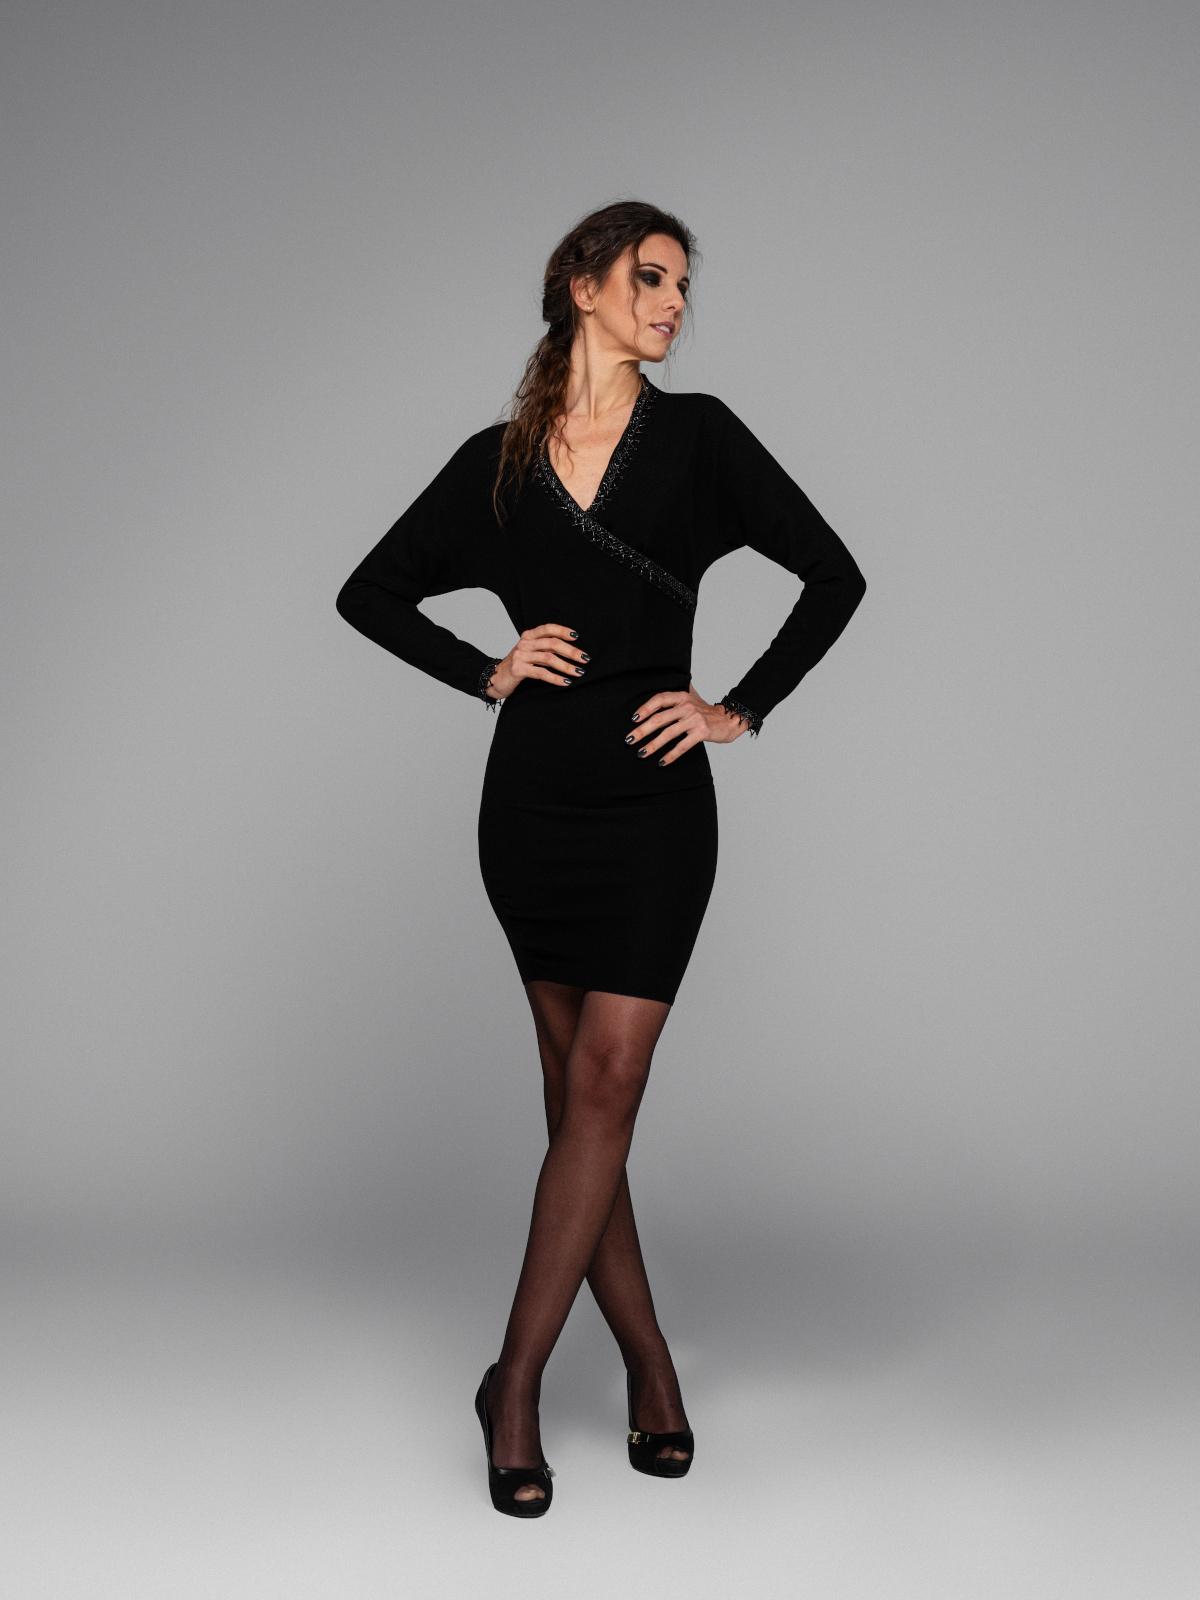 Imagen-diseño-colección-hoover-season-Inma-Saurina